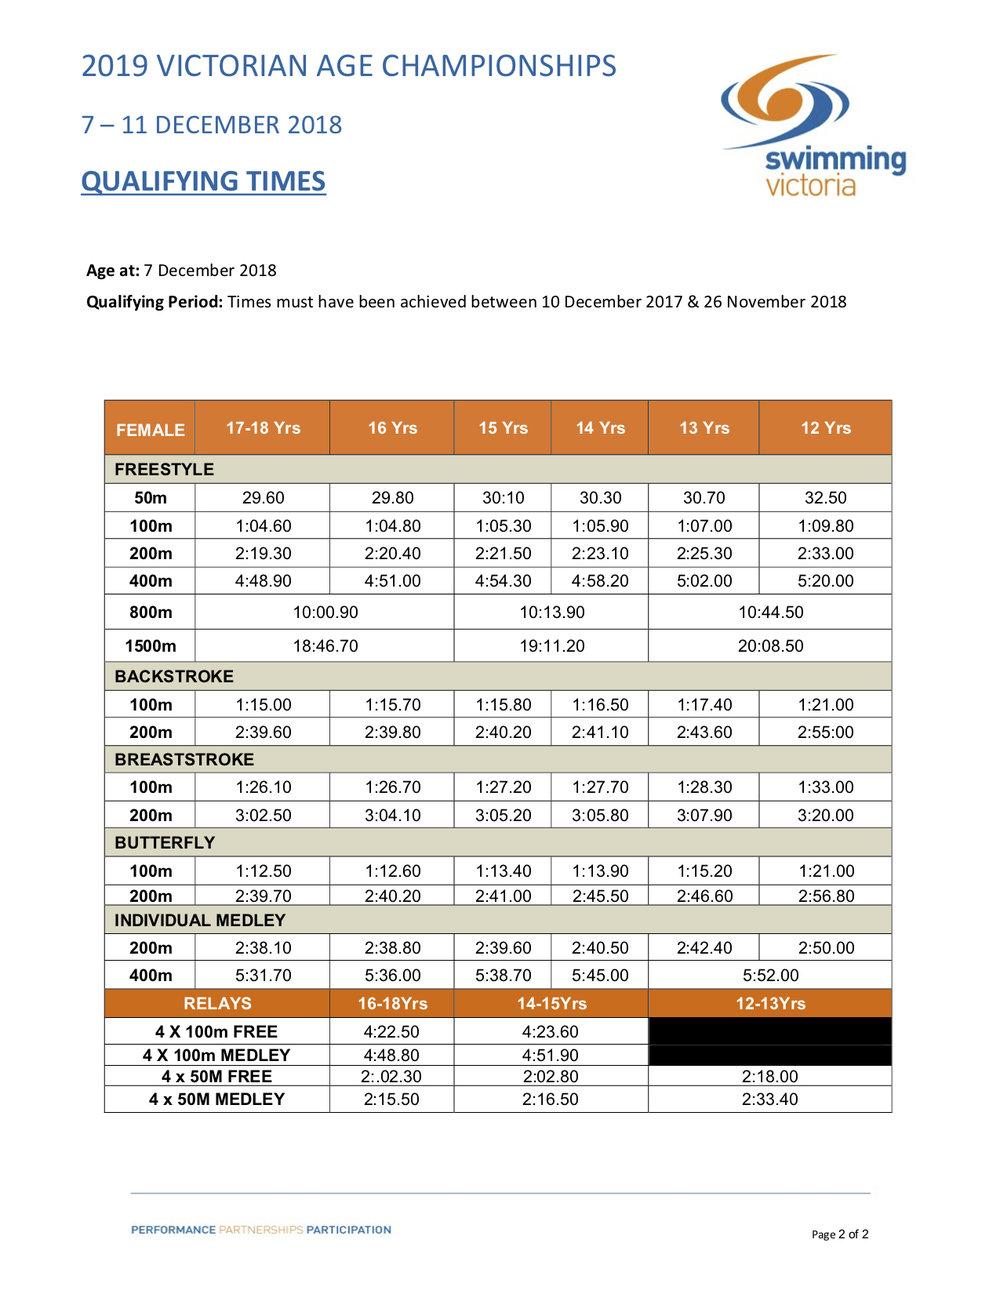 2019_Vic_Age_Championships_QT's pg2.jpg